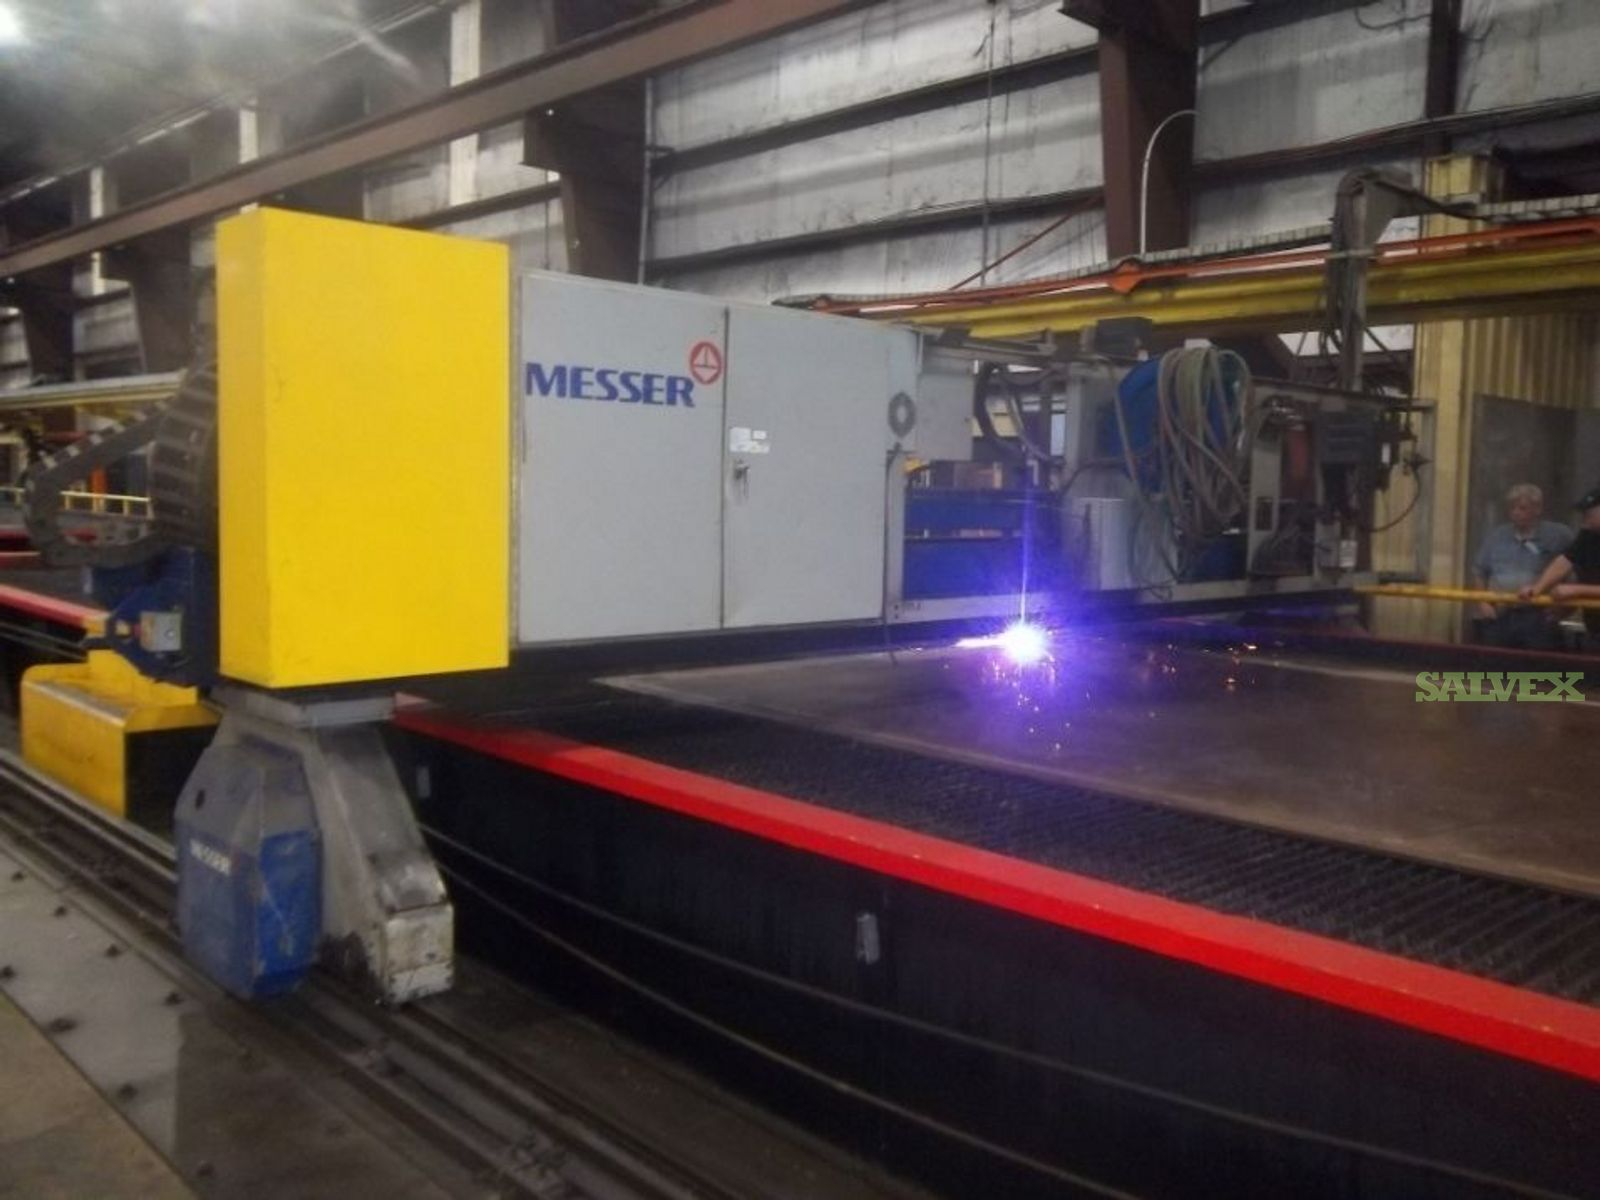 Messer Definition Cutting Gantry (1 Unit)